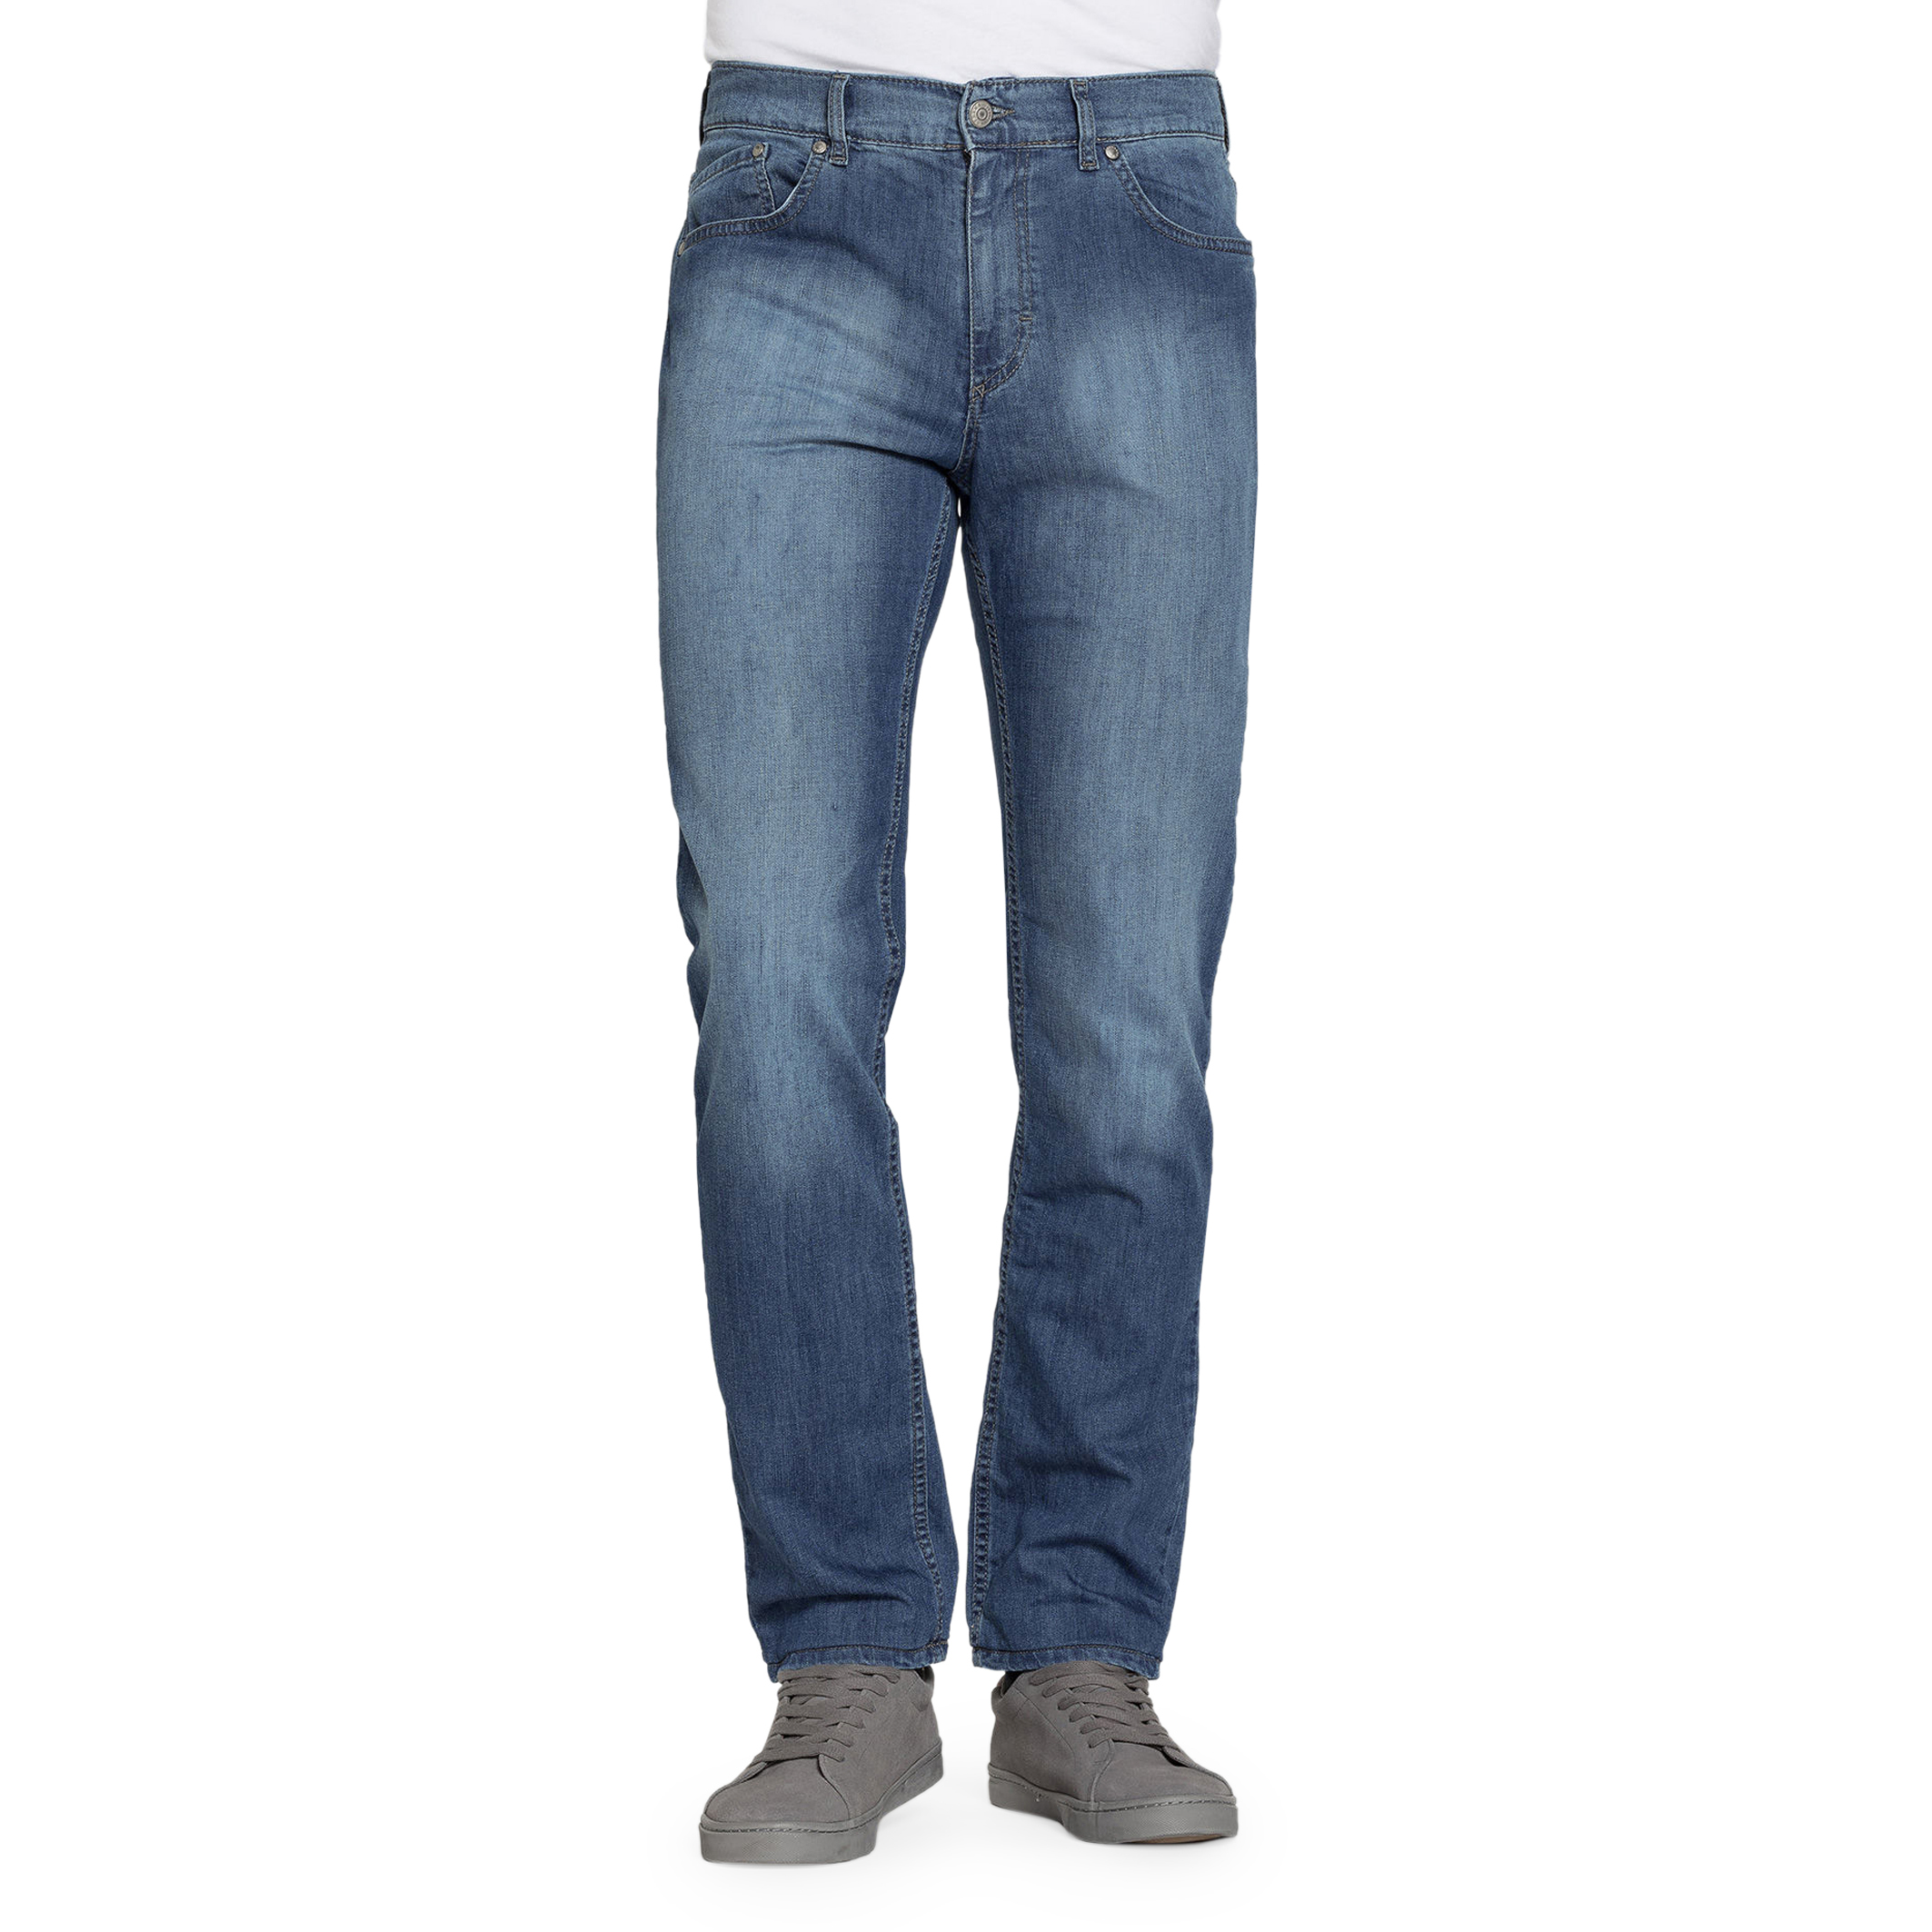 Carrera Jeans – 700-941A